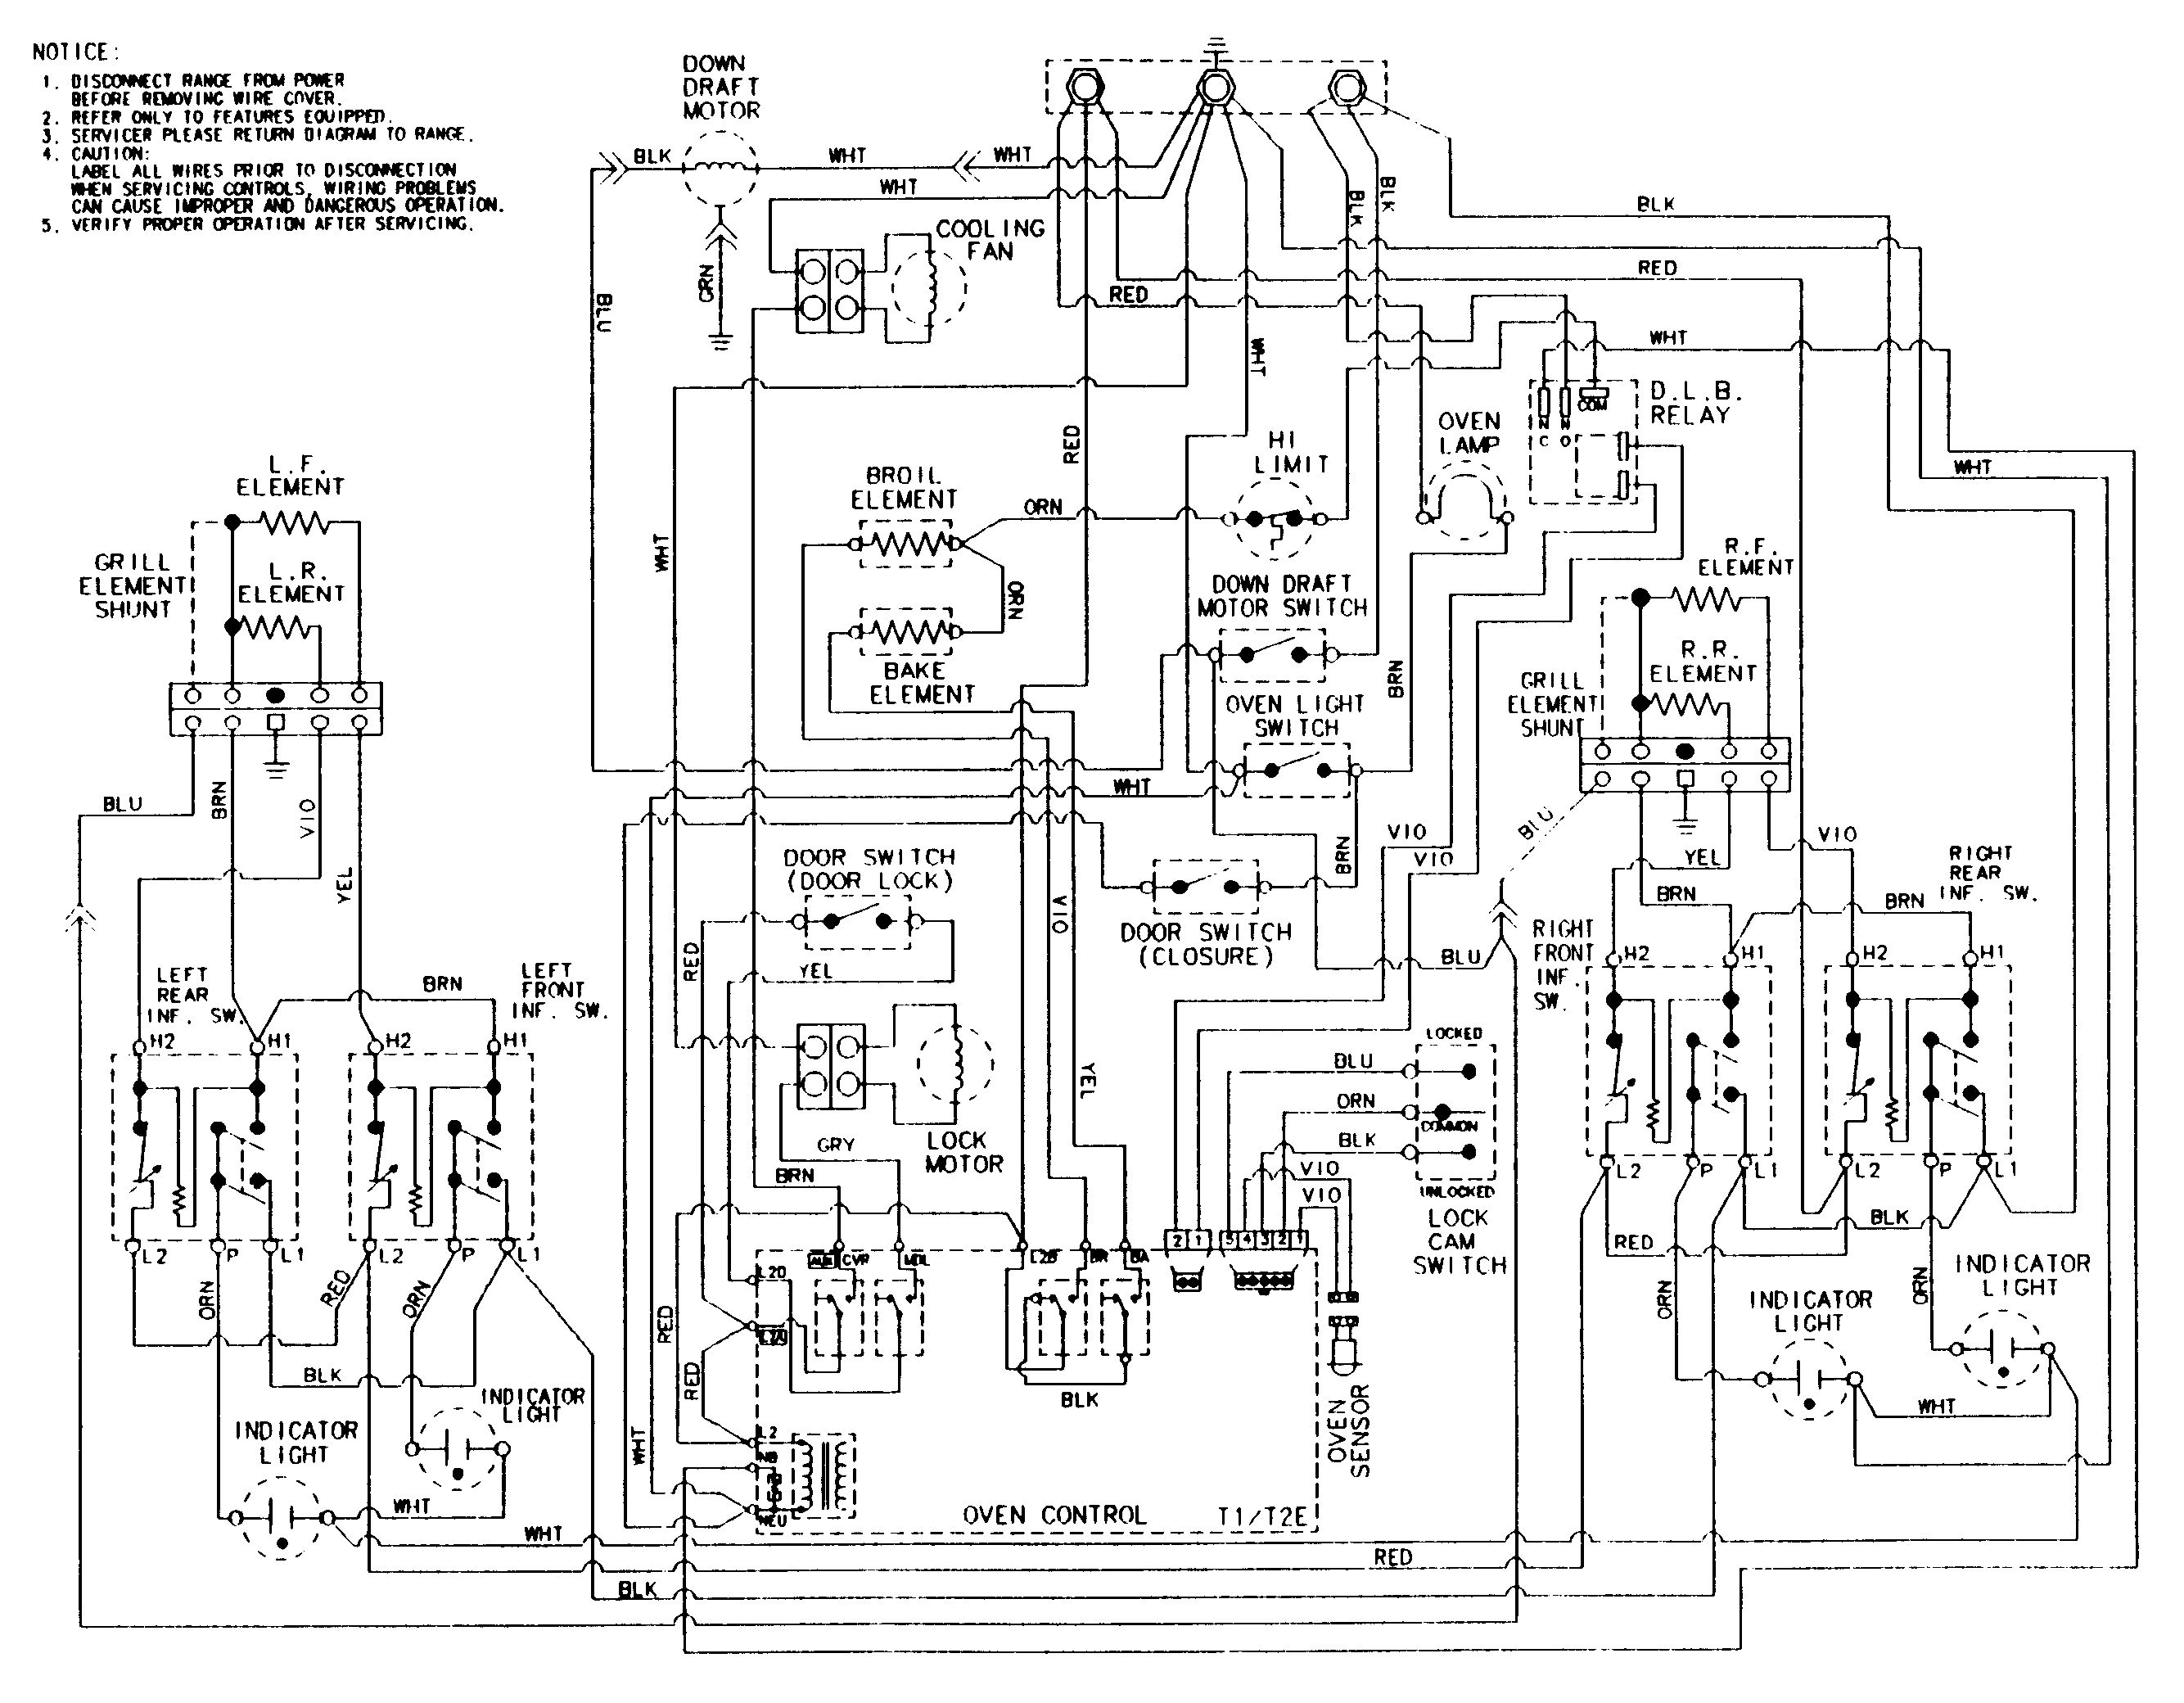 jenn air wiring diagrams wiring diagram query jenn air range wiring diagram jenn air wiring diagrams [ 2668 x 2080 Pixel ]